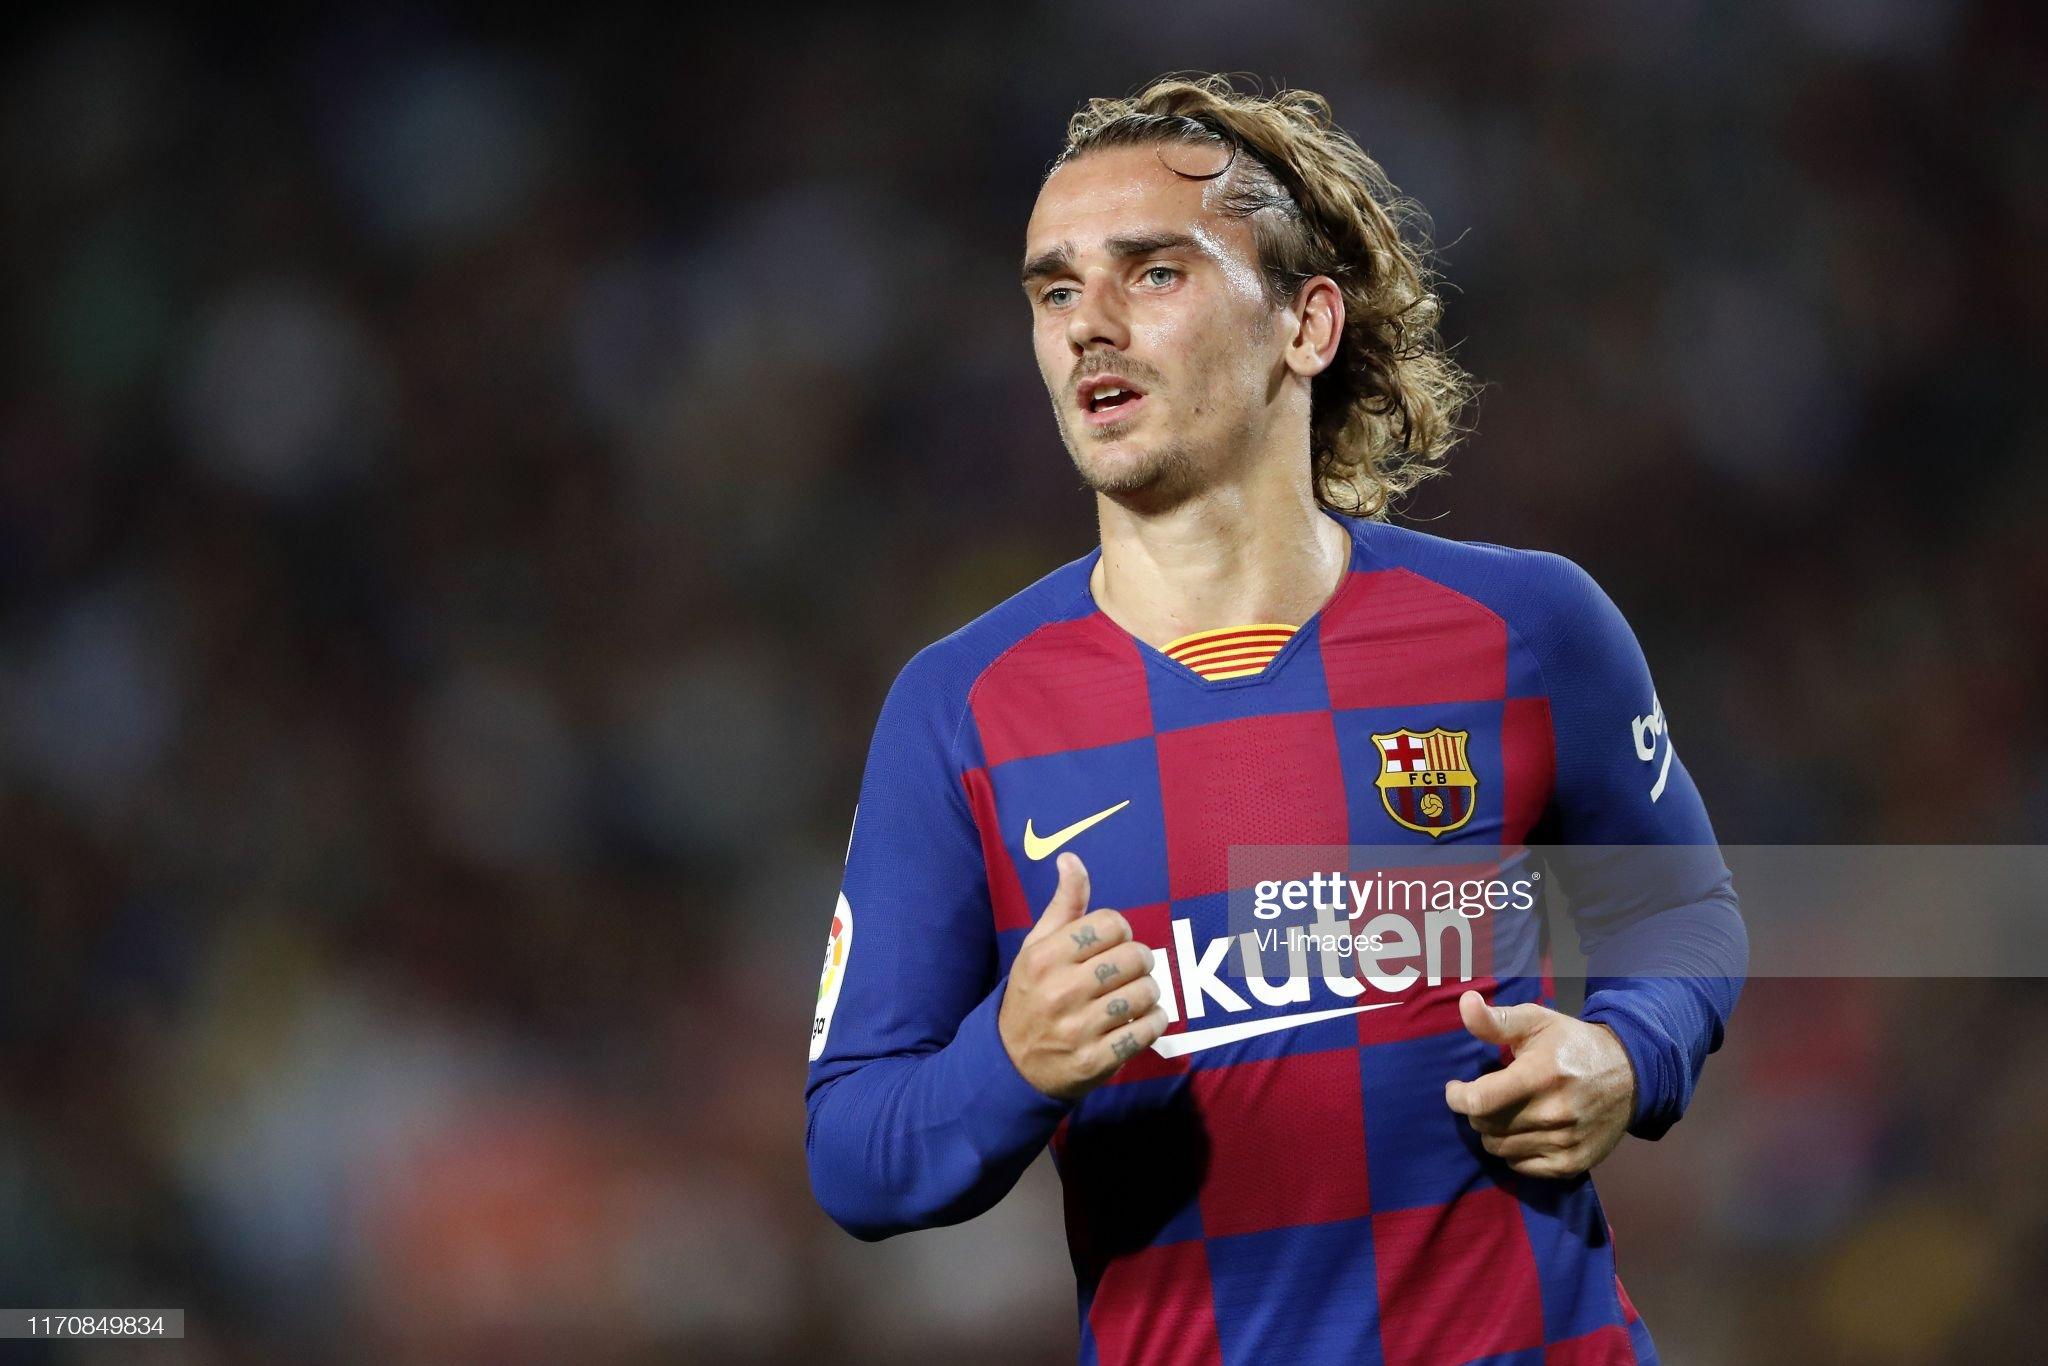 صور مباراة : برشلونة - فياريال 2-1 ( 24-09-2019 )  Antoine-griezmann-of-fc-barcelona-during-the-laliga-santander-match-picture-id1170849834?s=2048x2048